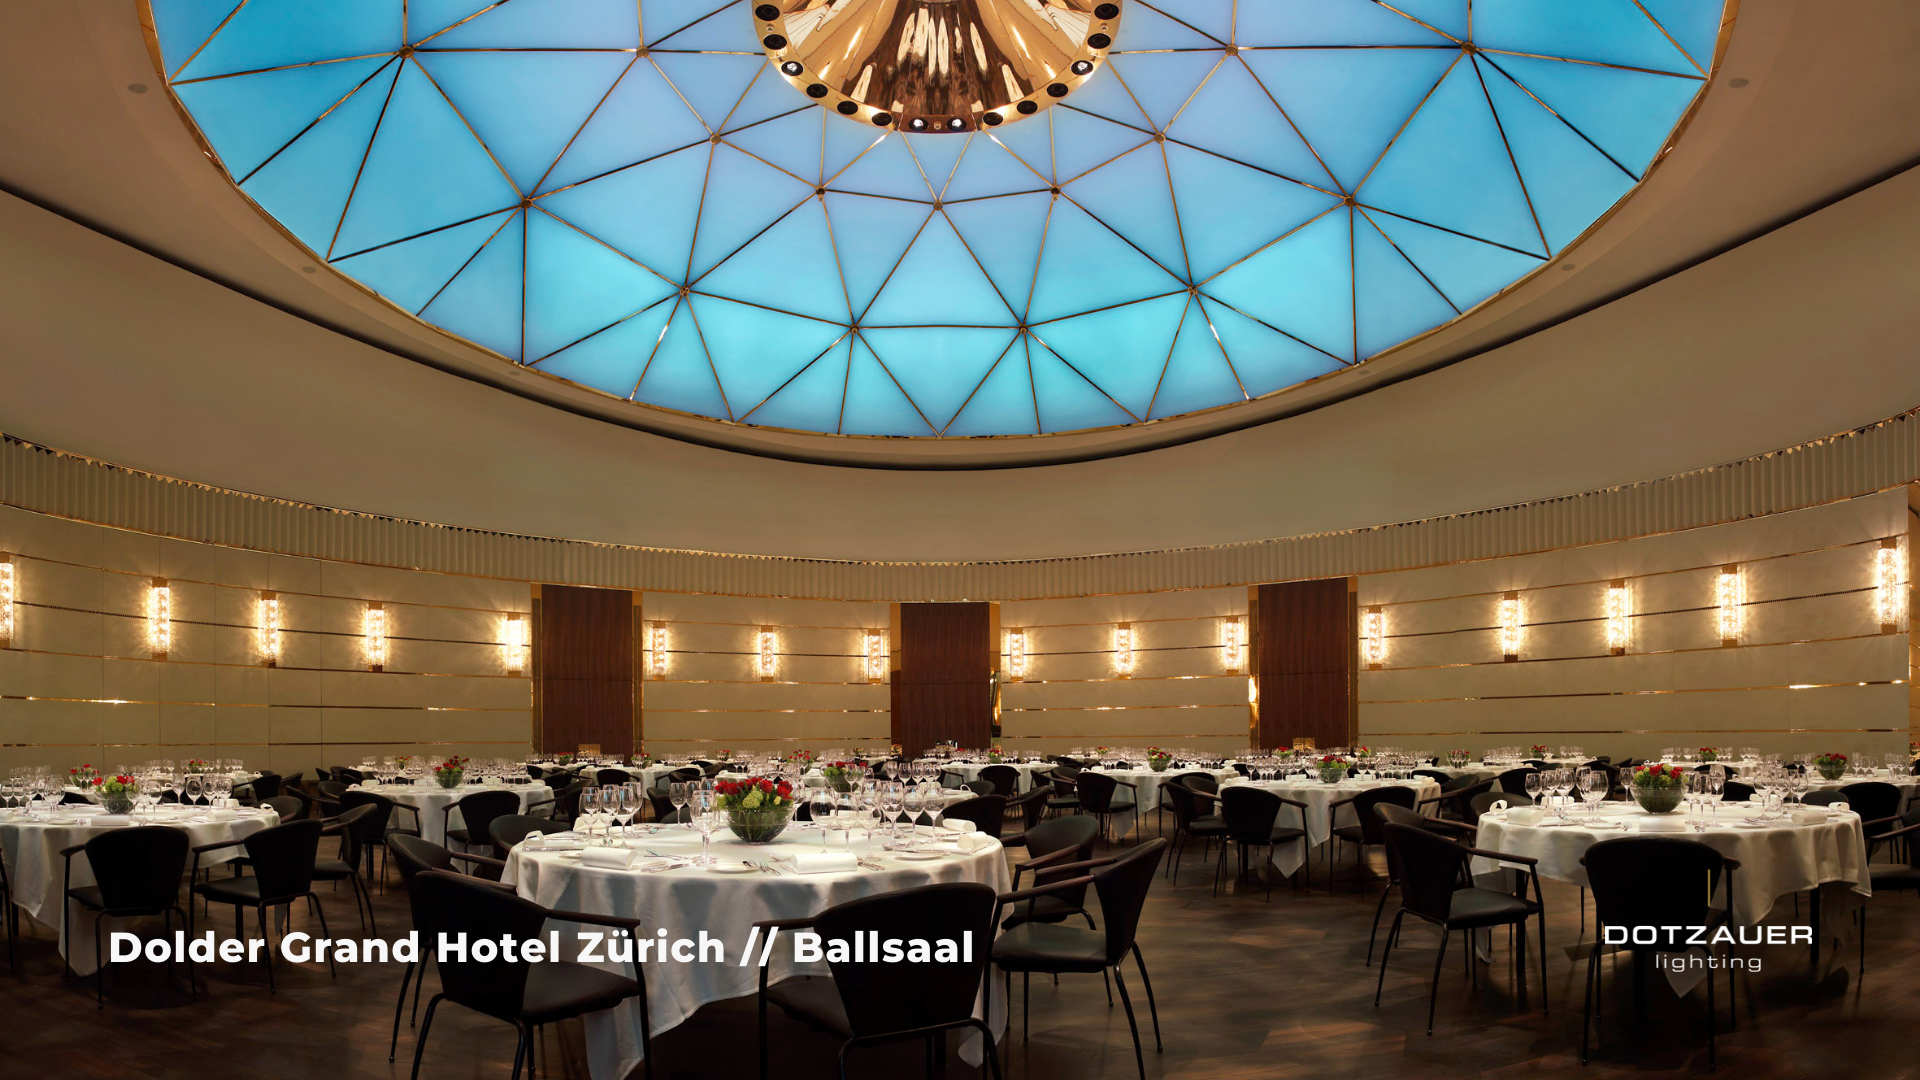 The Dolder Grand Hotel - Ballroom